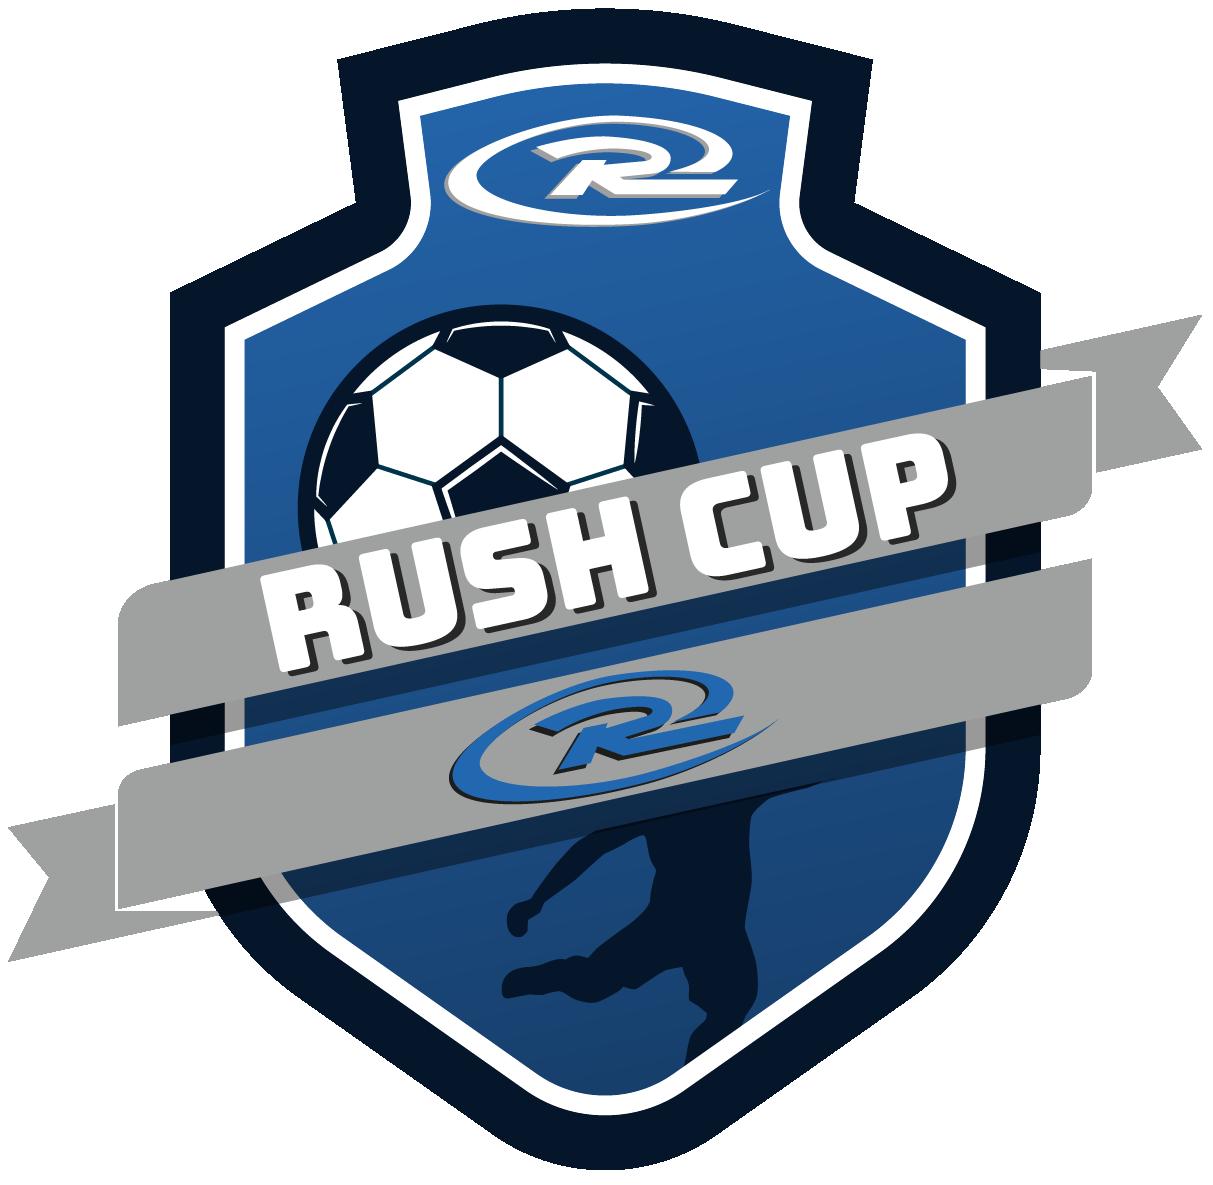 Rush-Cup-logo